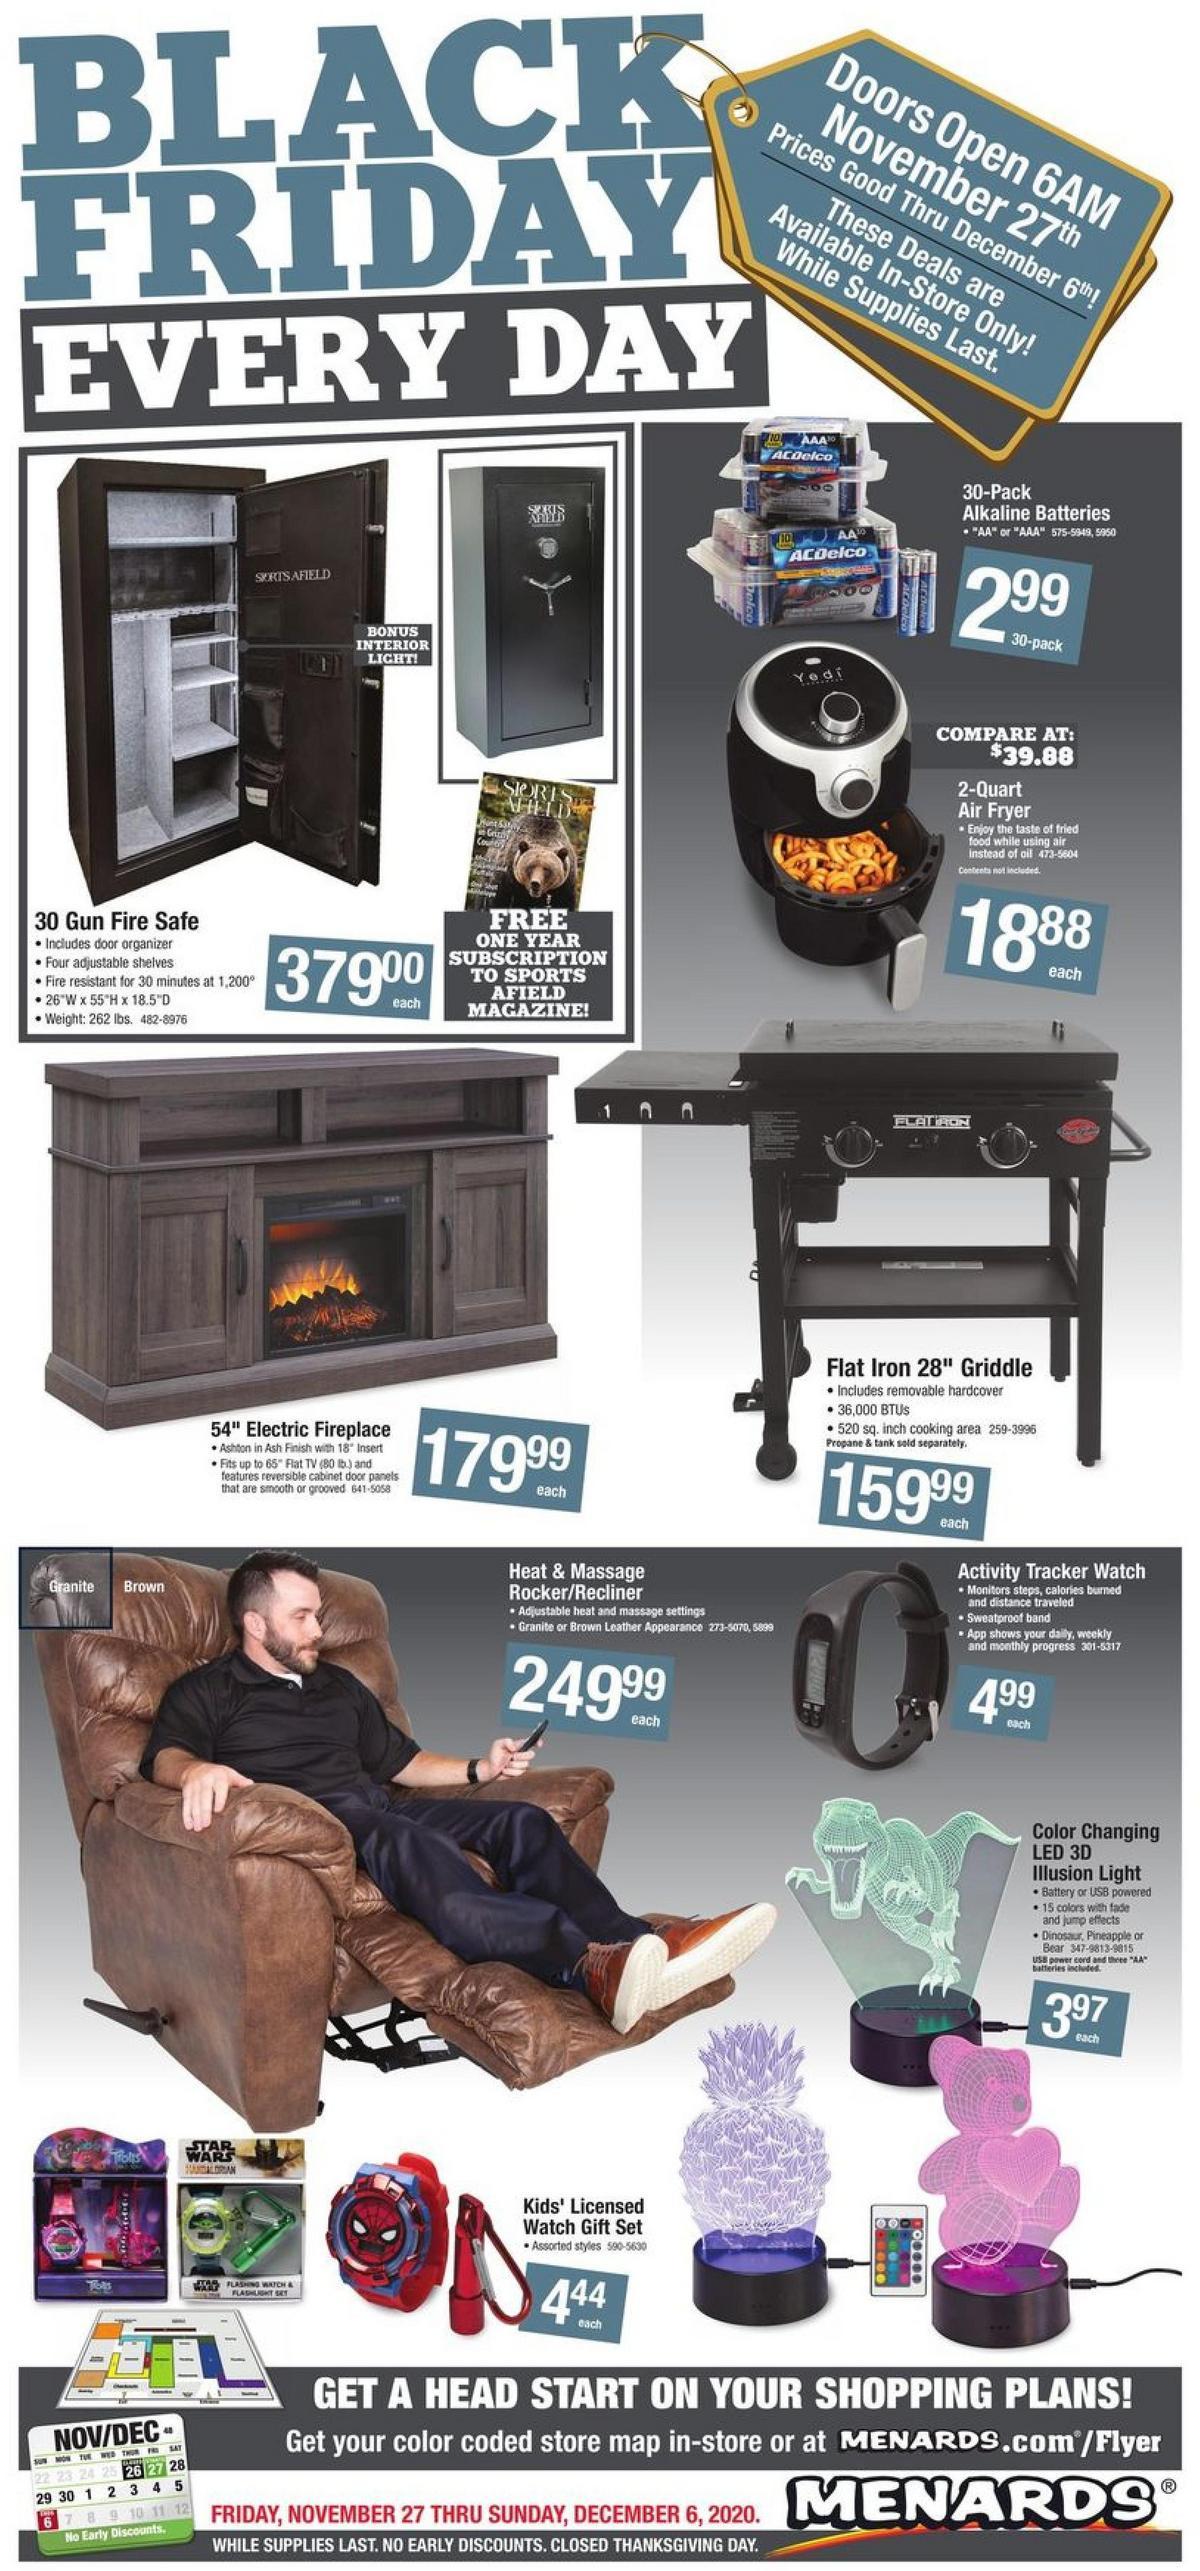 Menards Black Friday Sale Weekly Ad from November 27